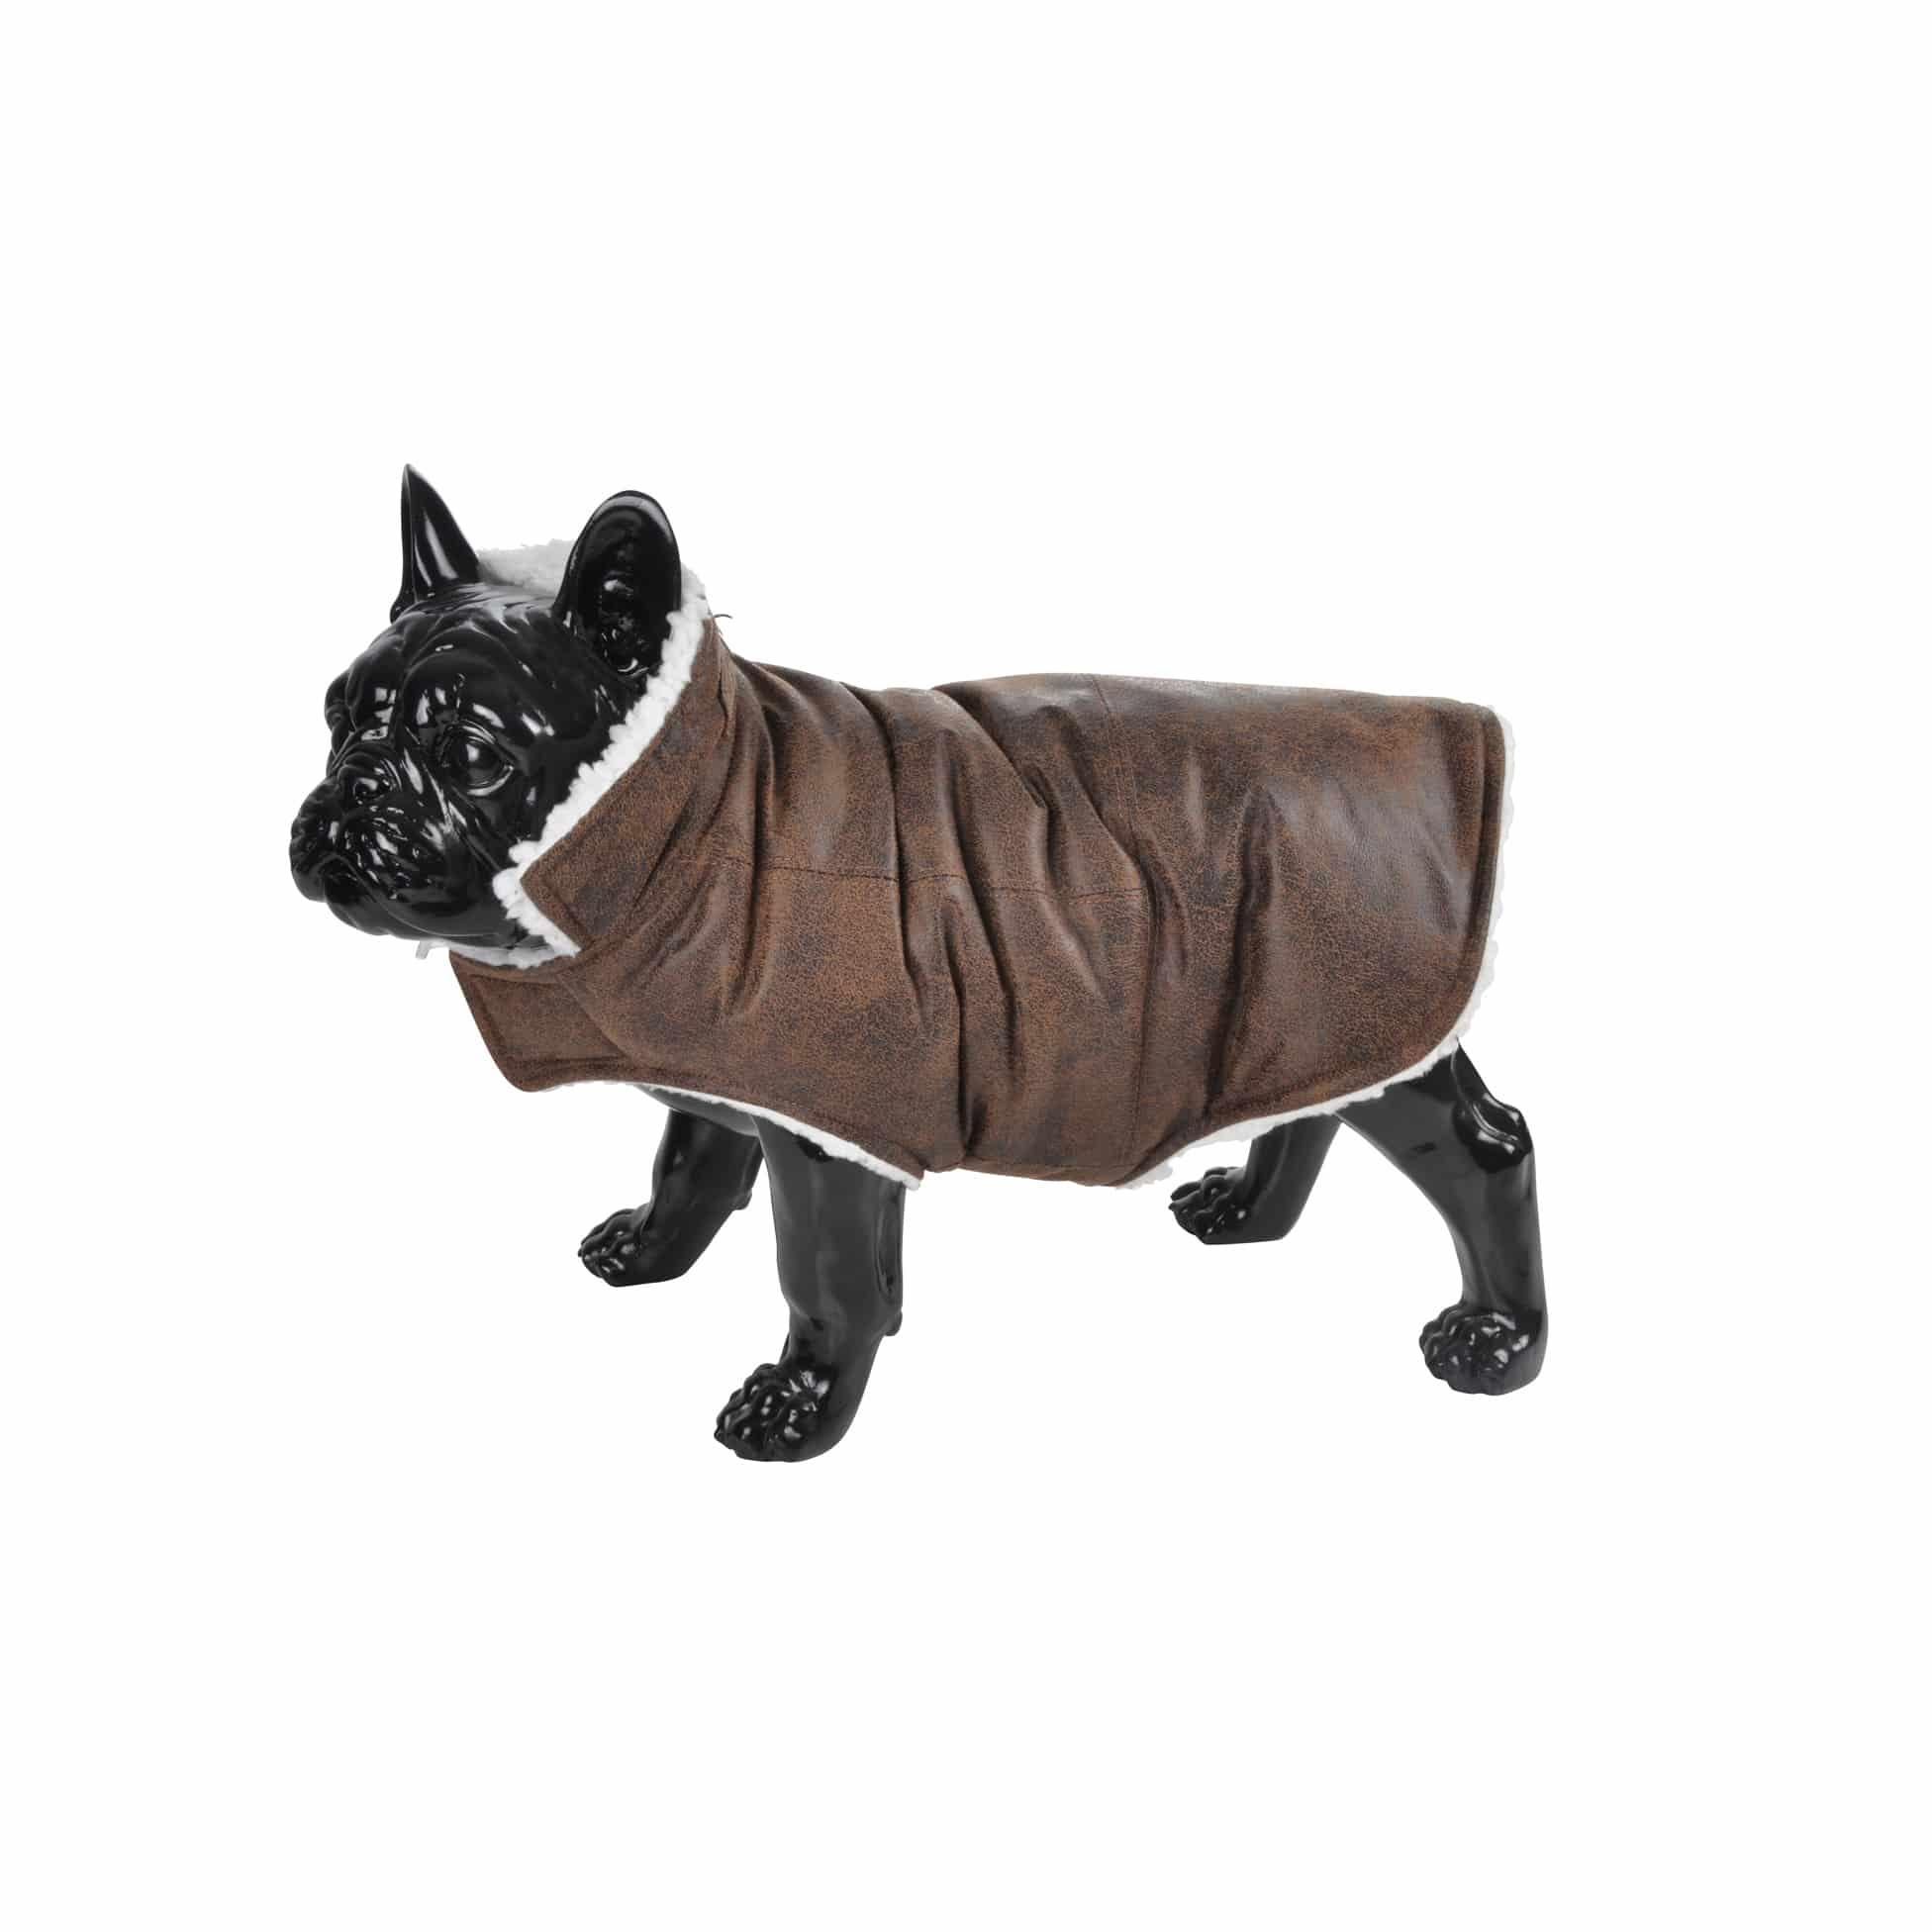 4Goodz warm lederlook vliegeniersjas hondenjas 30 cm - Chocolade Bruin